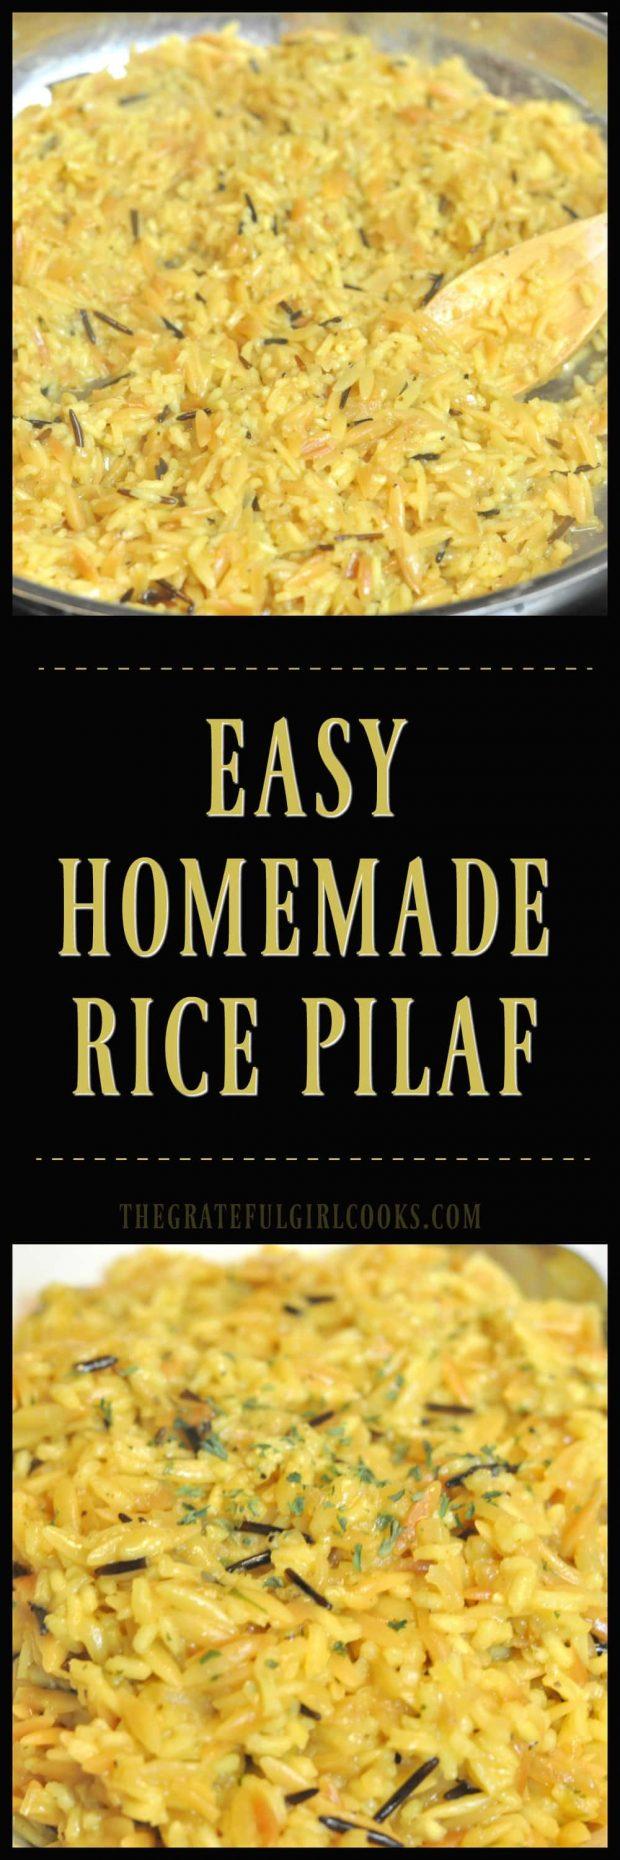 Easy Homemade Rice Pilaf / The Grateful Girl Cooks!